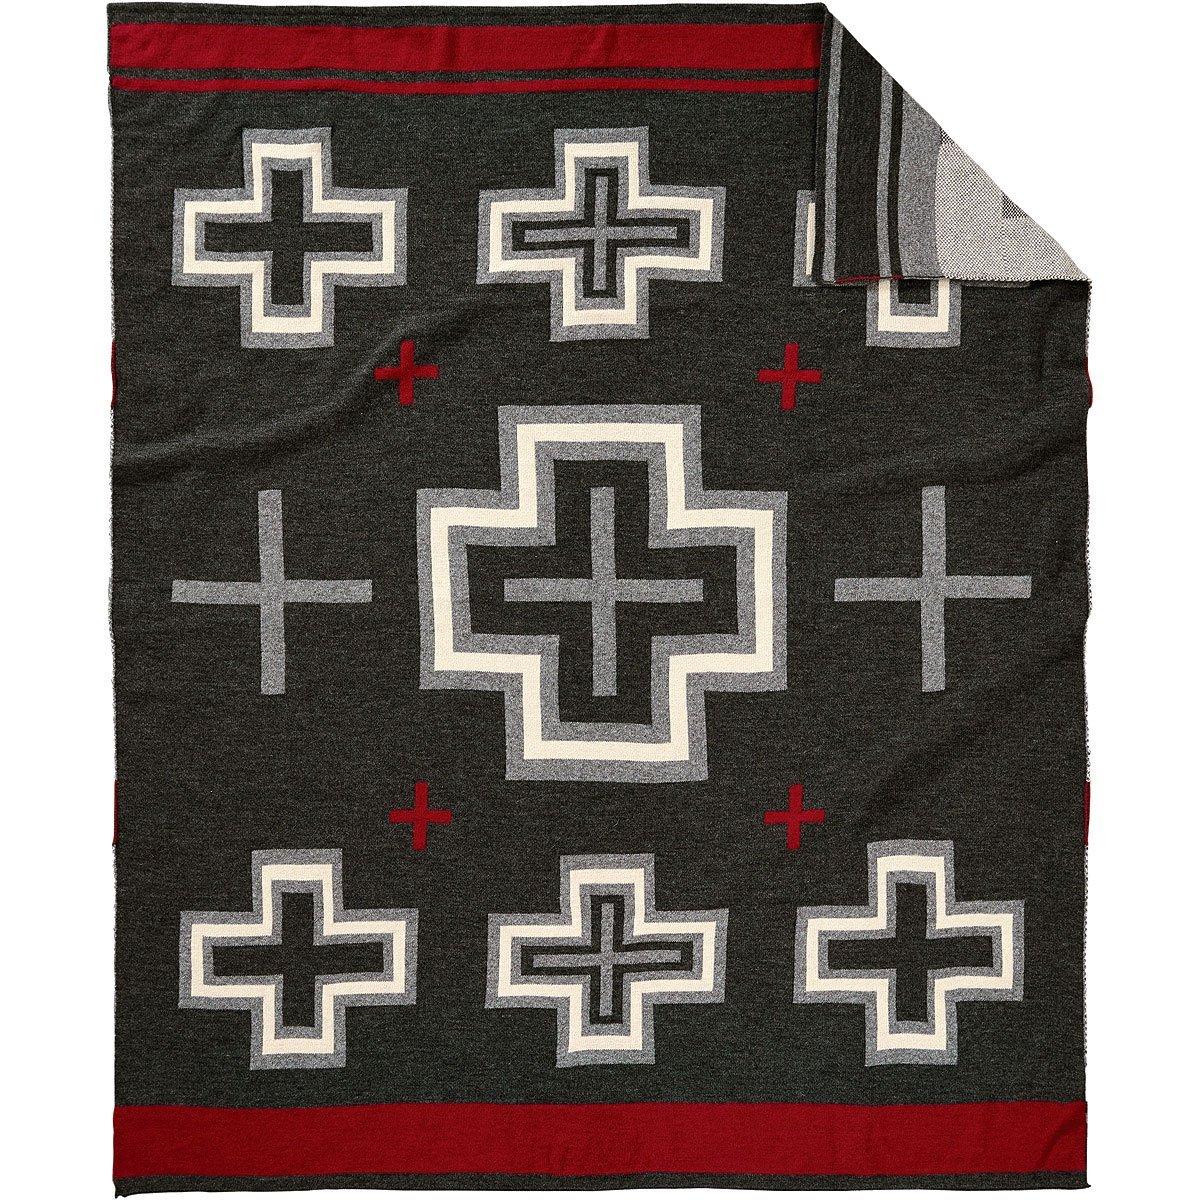 San Miguel Knit Throw by Pendleton B01DQ3FJX0